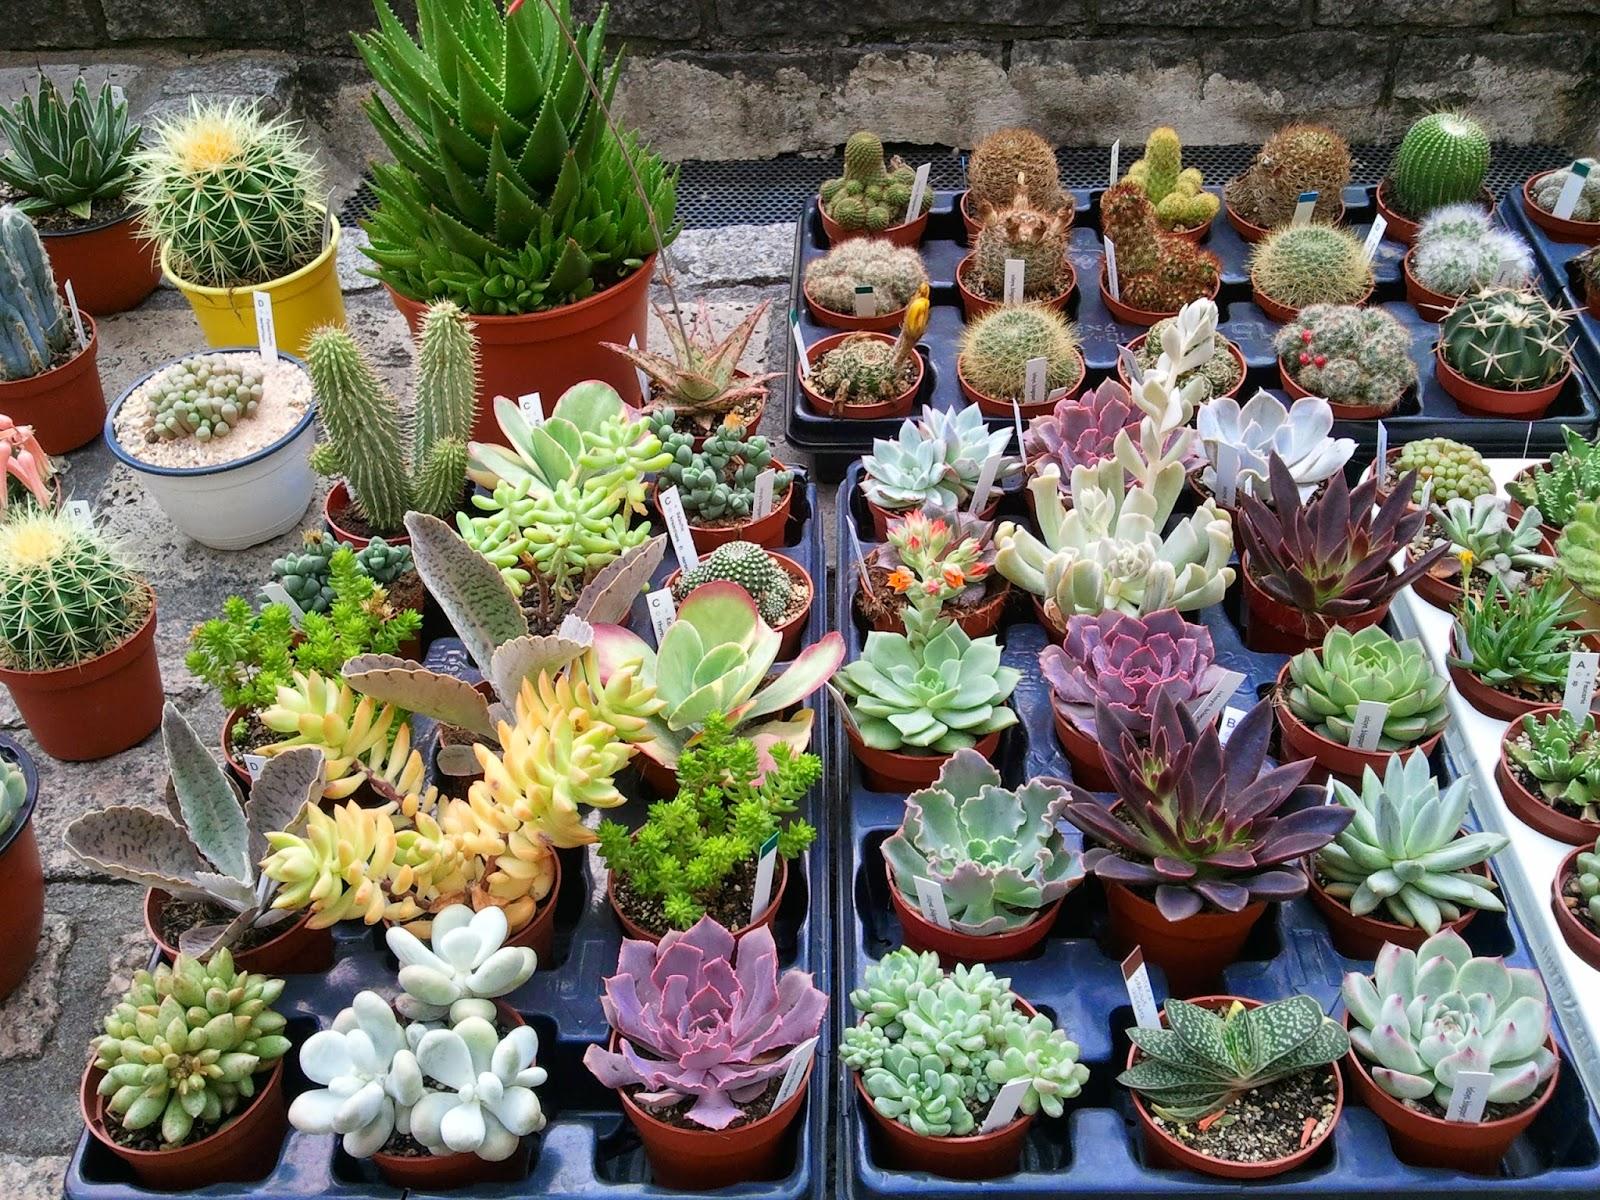 Landare azokak cactus islaya for Vivero de cactus